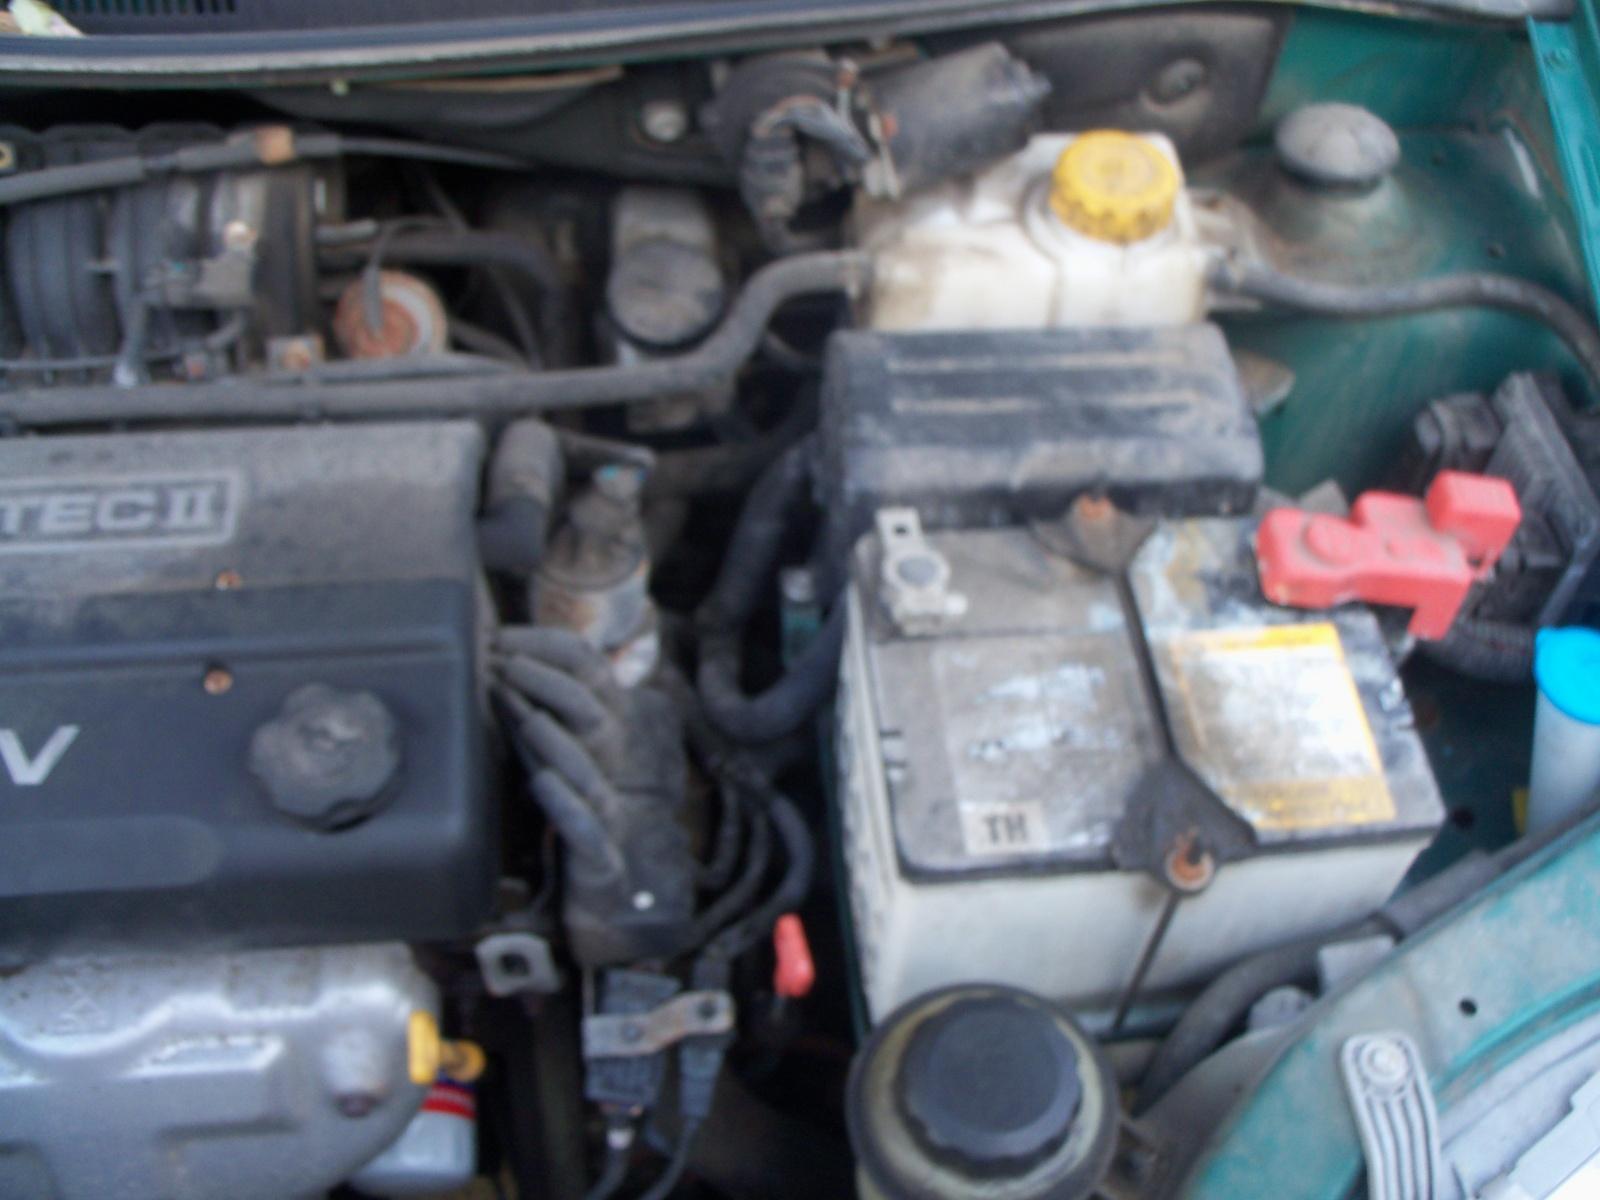 Aveo 2009 Engine Compartment Fuse Box Diagram Car Part Diagrams